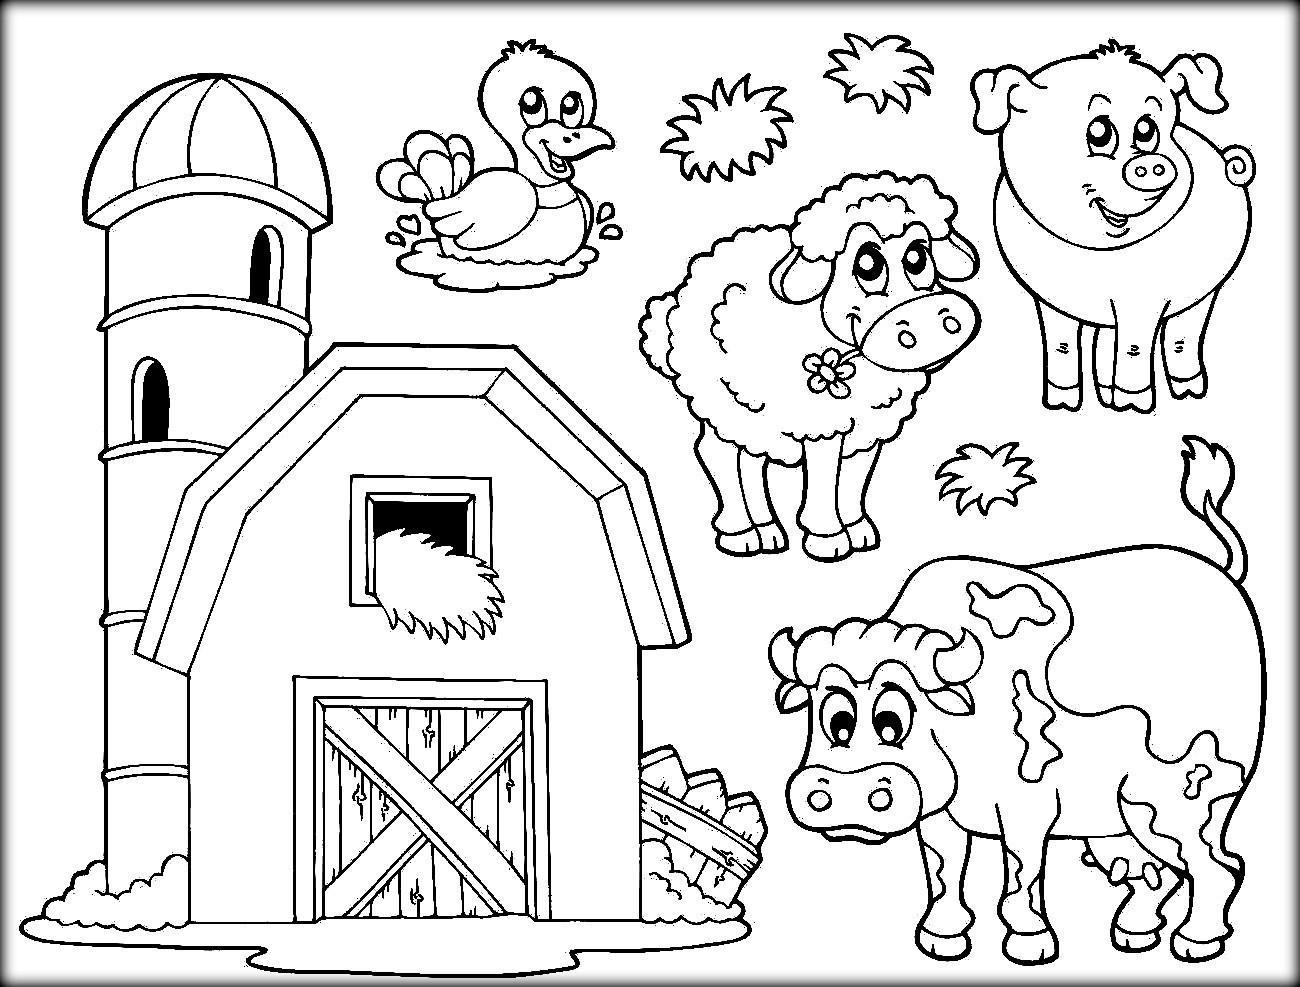 Kids Farm Coloring Pages Simple Farmer Coloring Pages For Kids Printable Coloring Page For Kids